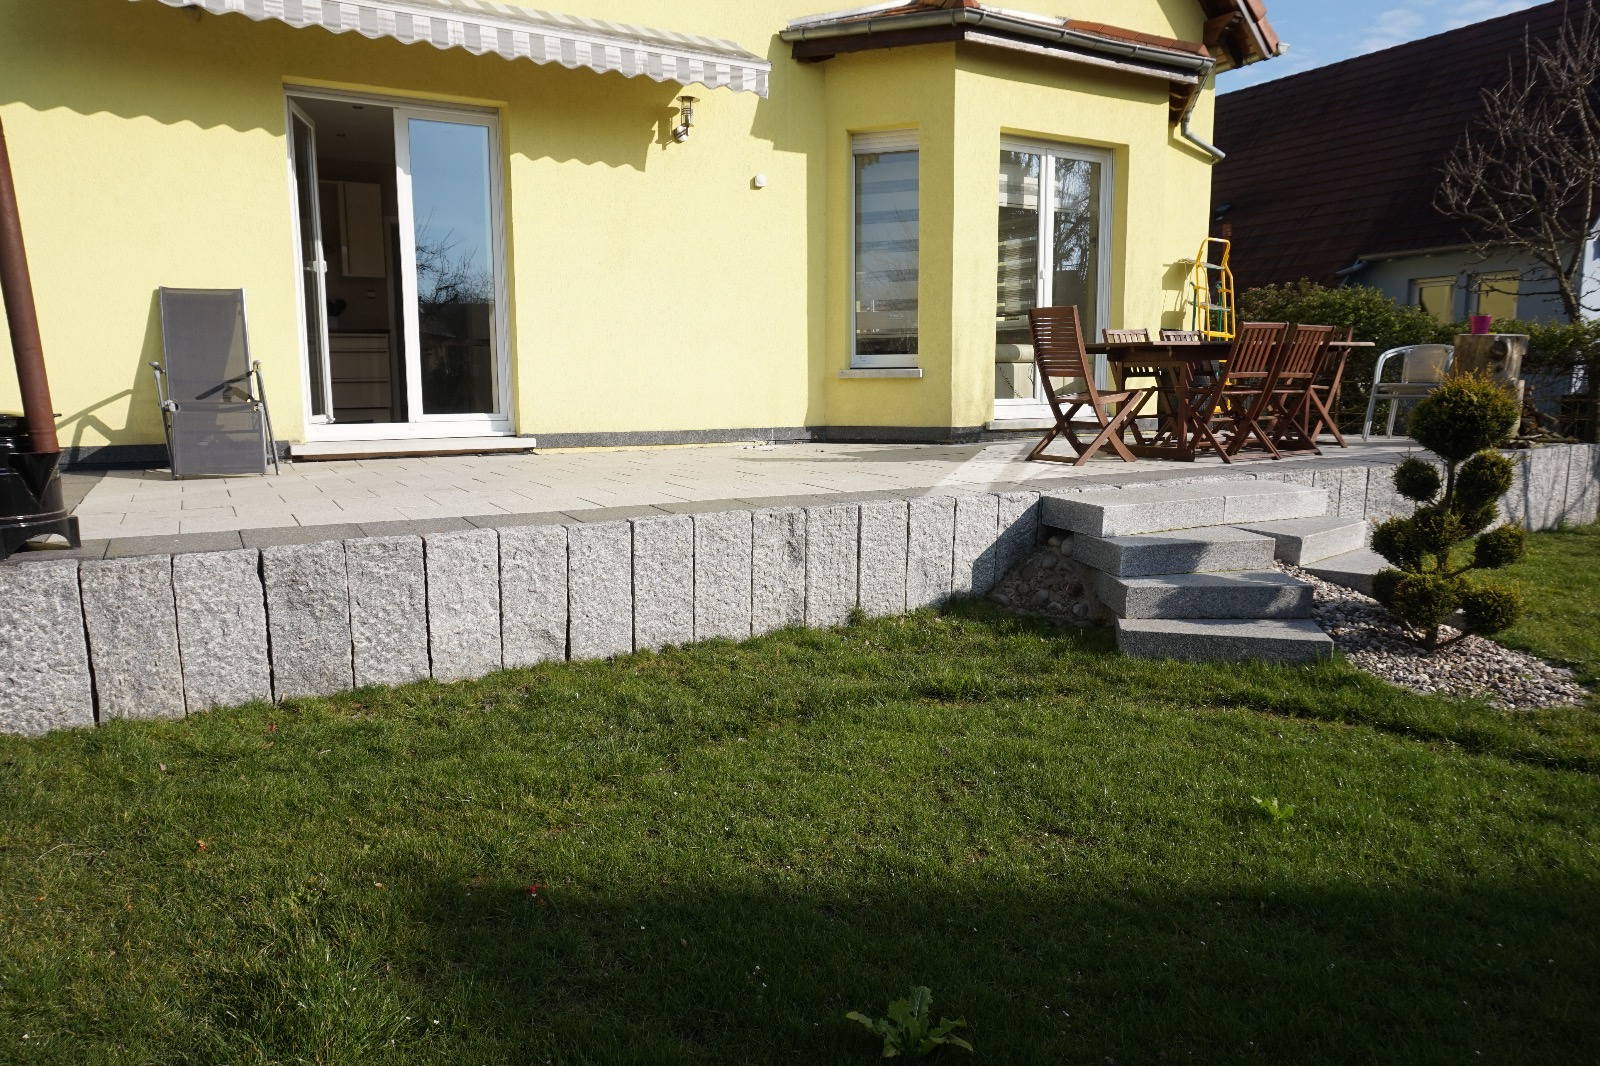 Vente strasbourg meinau neuhof maison familiale de 170m2 avec jardin - Maison jardin versailles strasbourg ...